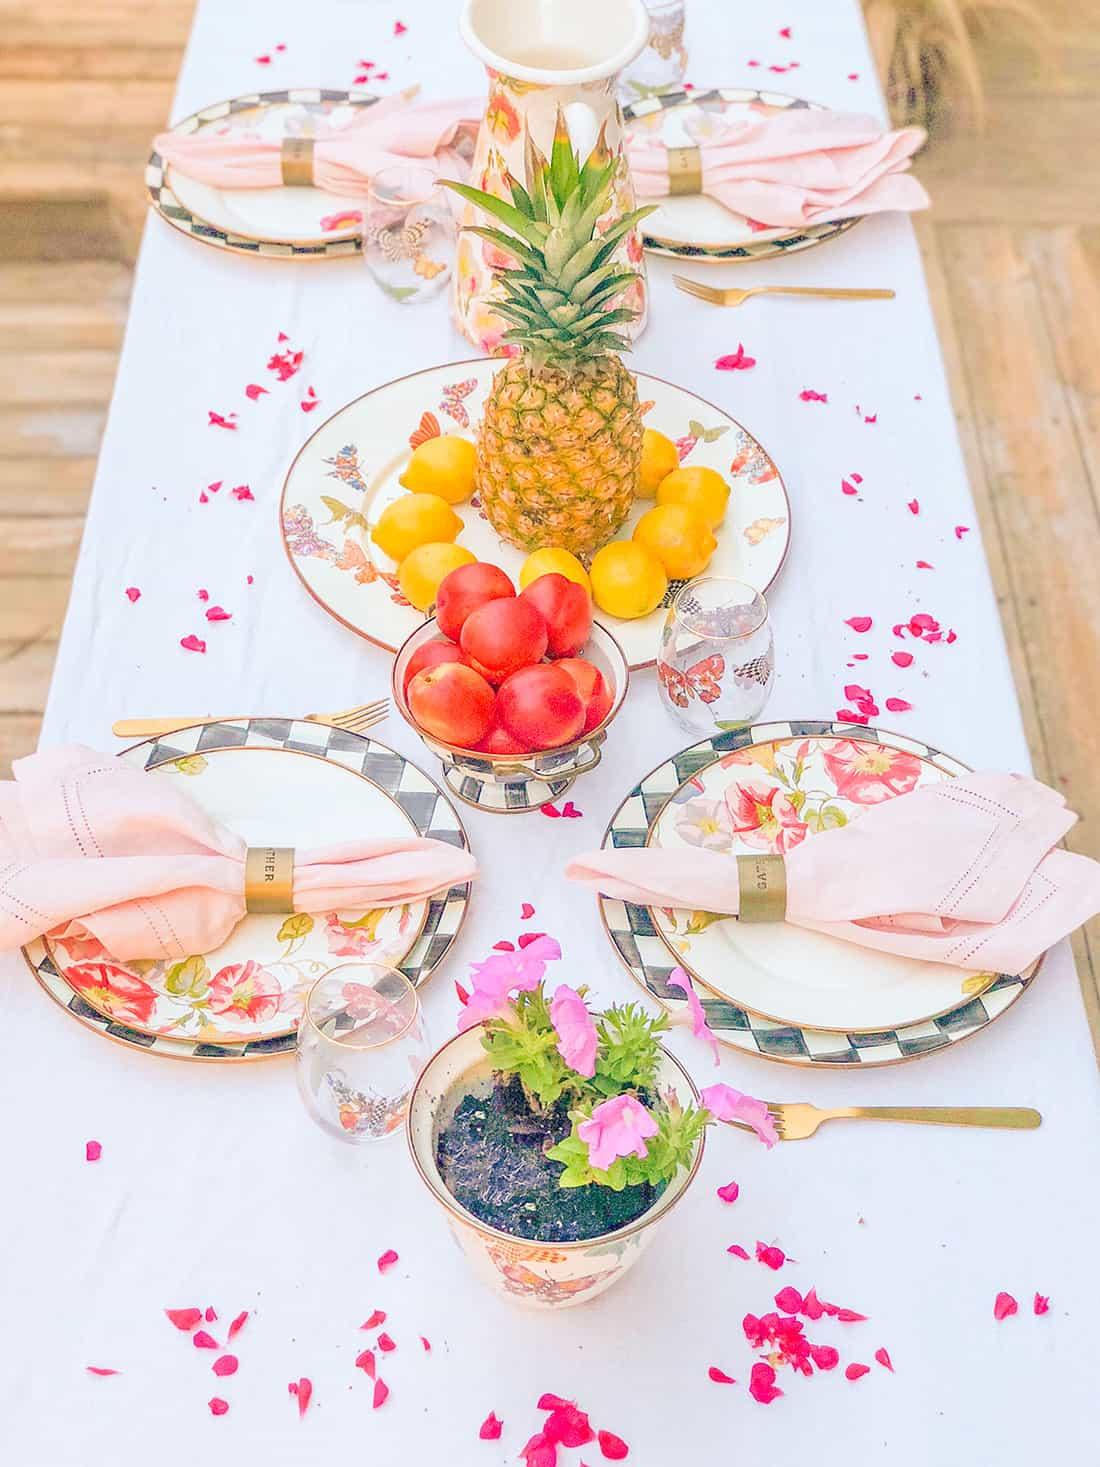 MacKenzie-Childs summer table setting Shaunda Necole